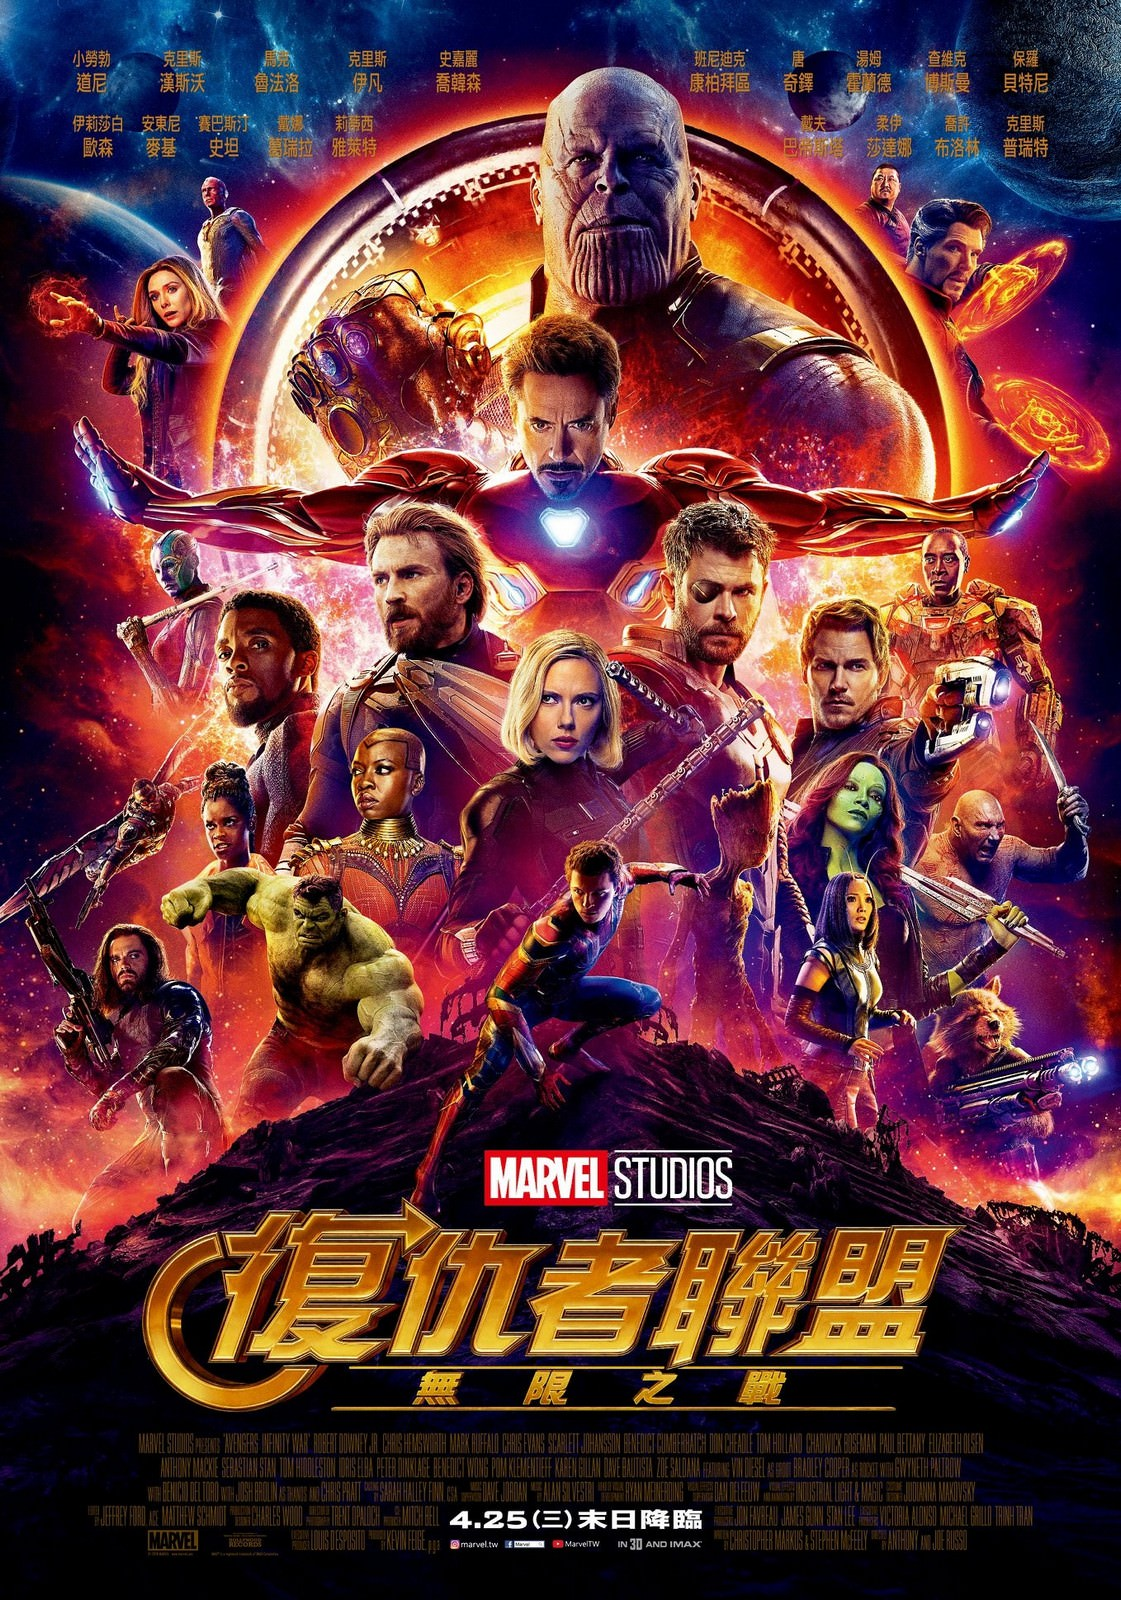 Movie, Avengers: Infinity War(美國) / 復仇者聯盟:無限之戰(台) / 复仇者联盟3:无限战争(中) / 復仇者聯盟3:無限之戰(港), 電影海報, 台灣